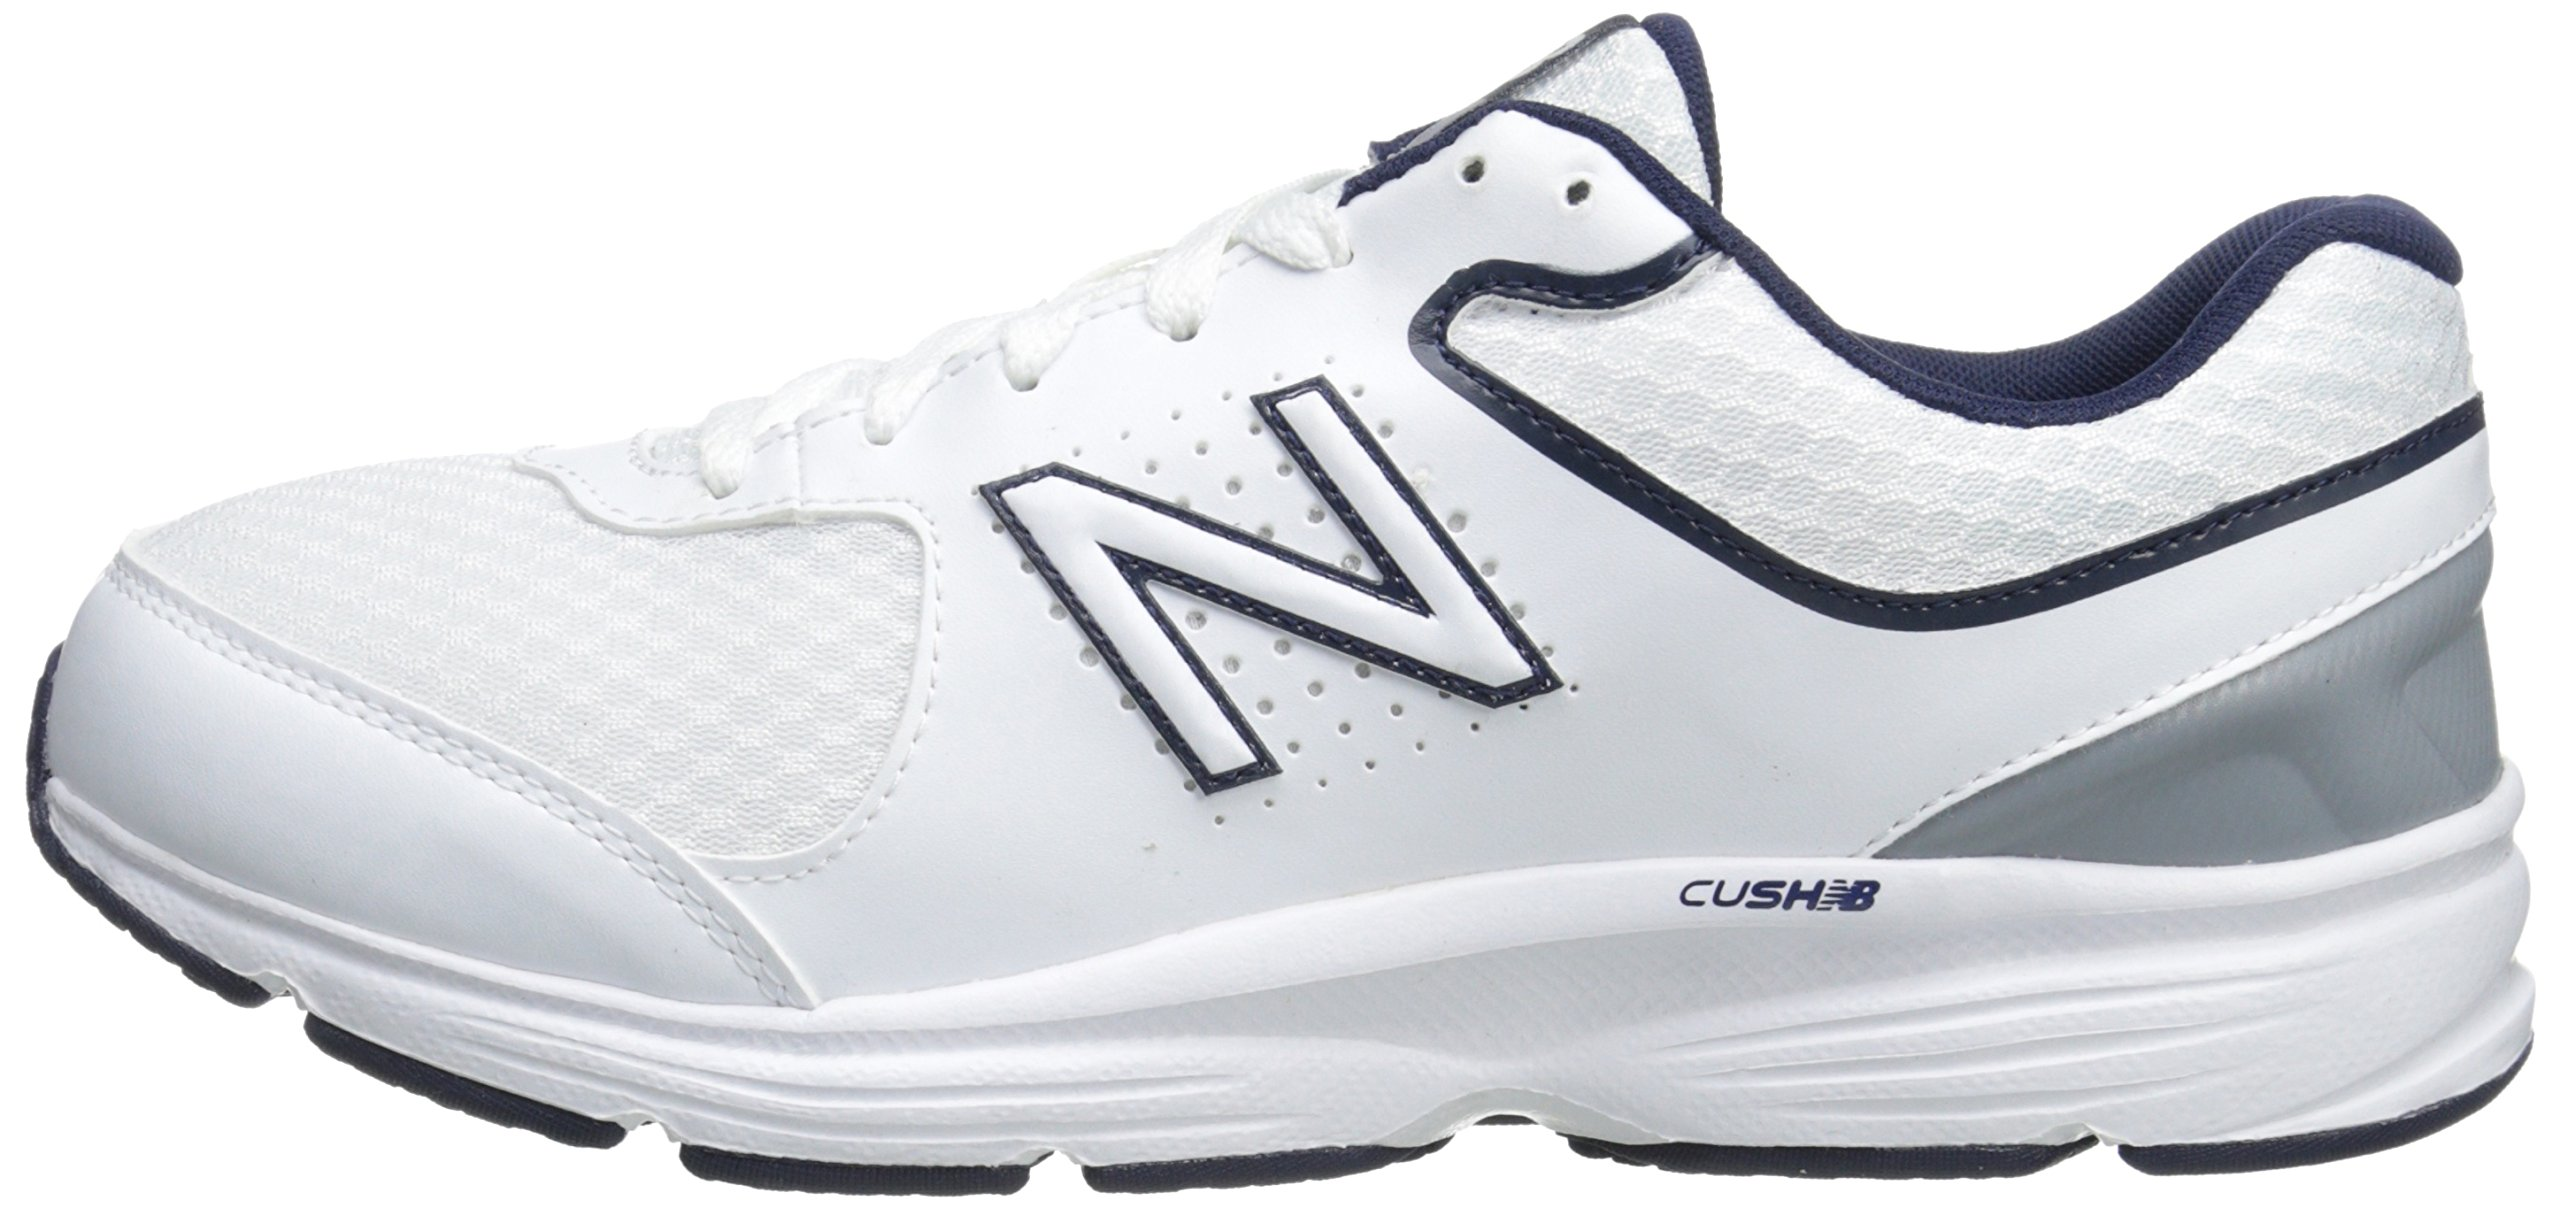 MW411v2 Walking Shoe - Choose SZ/color